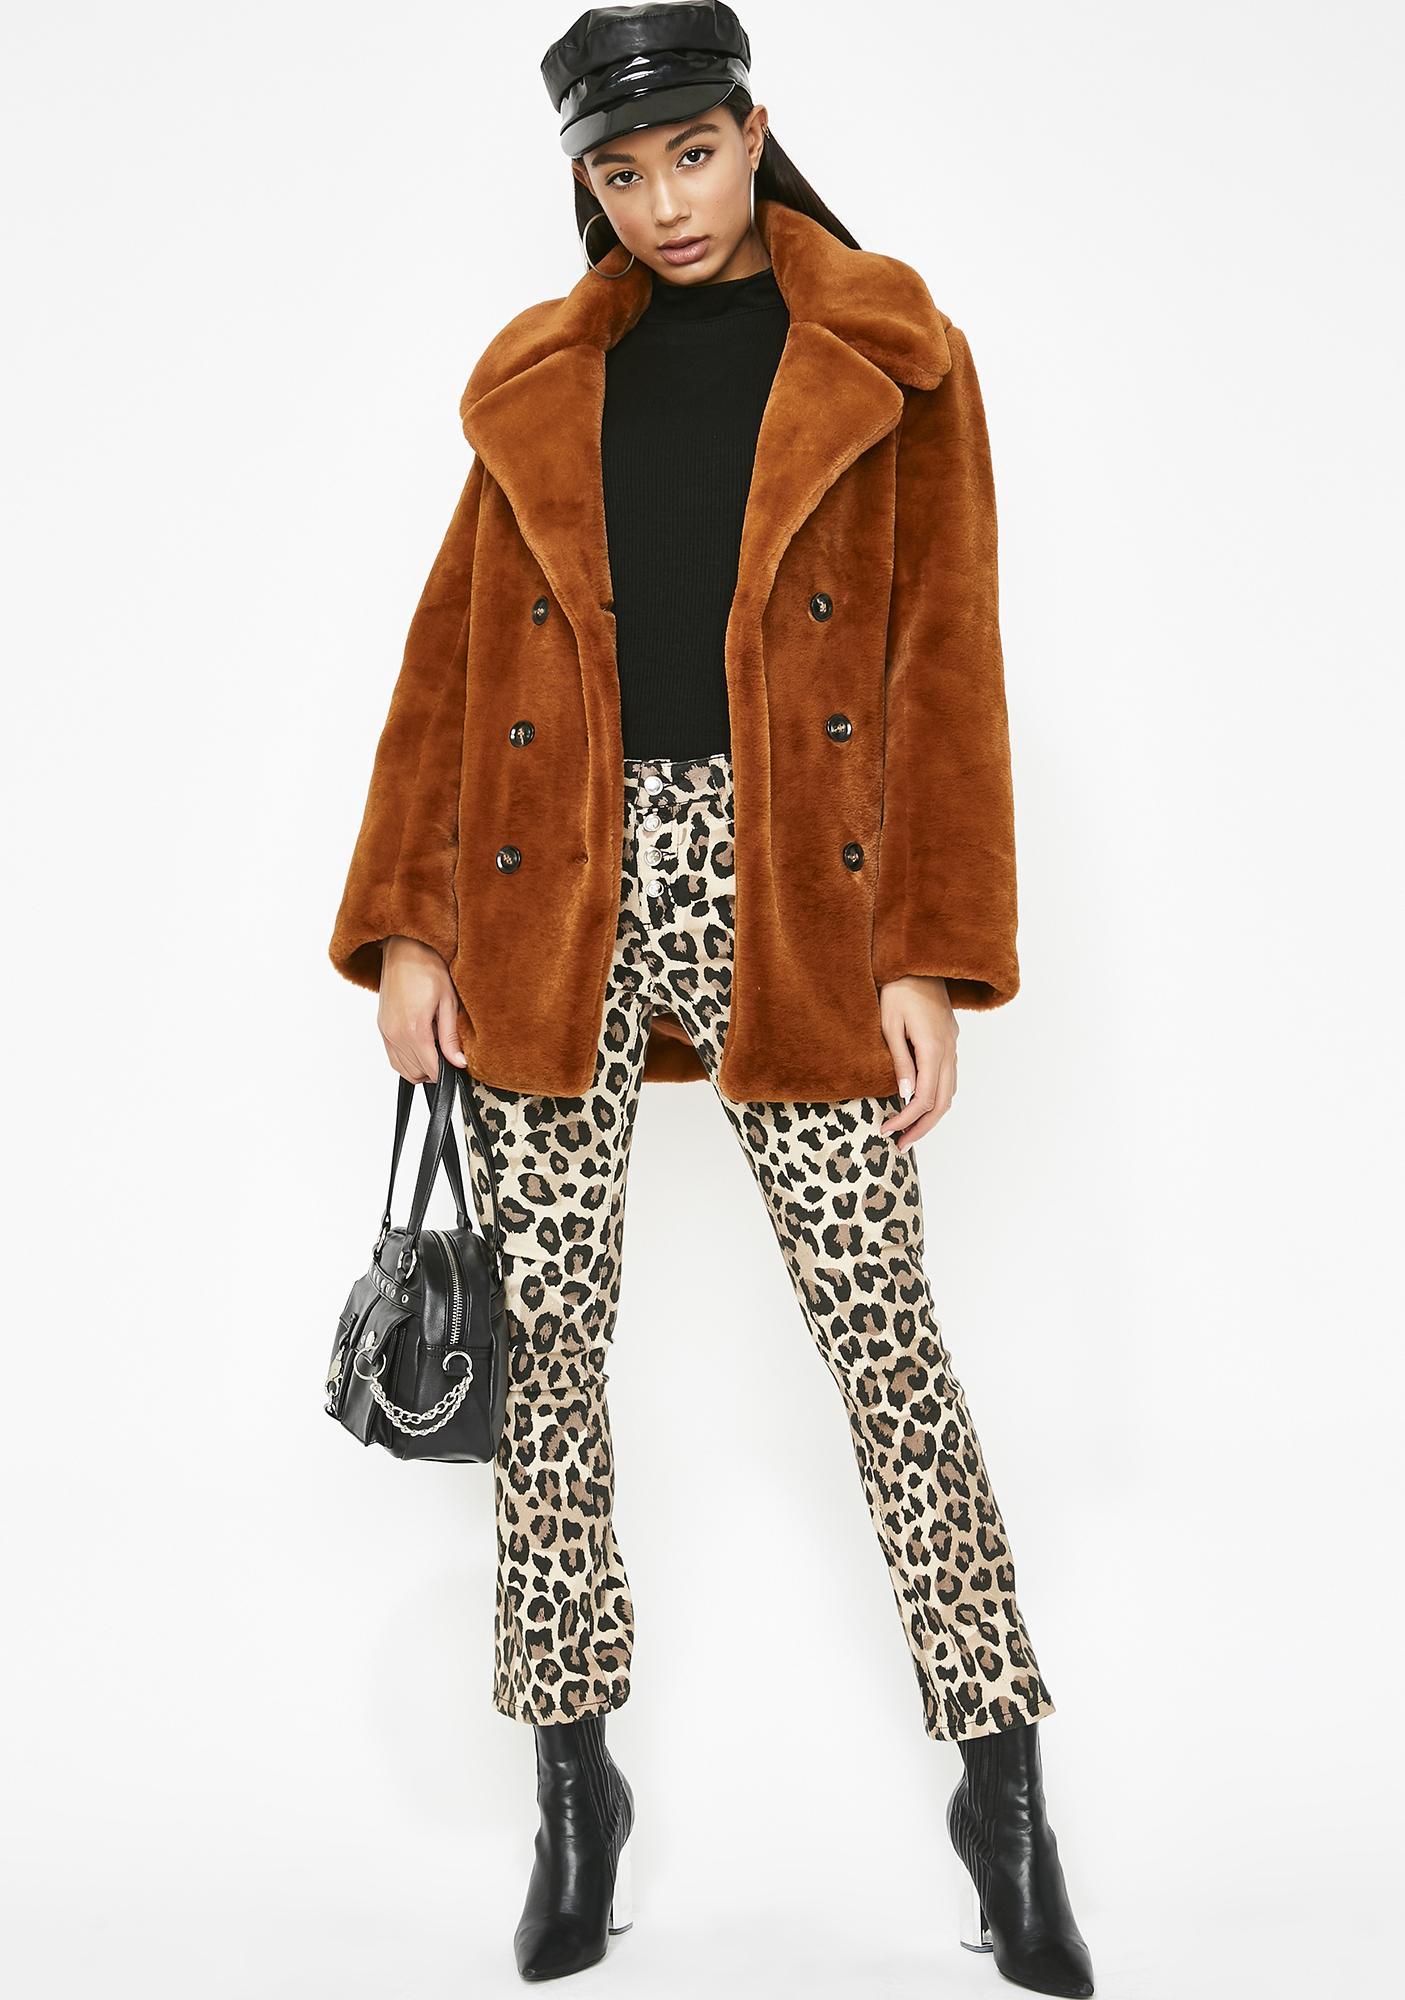 Sassy Chic Furry Jacket